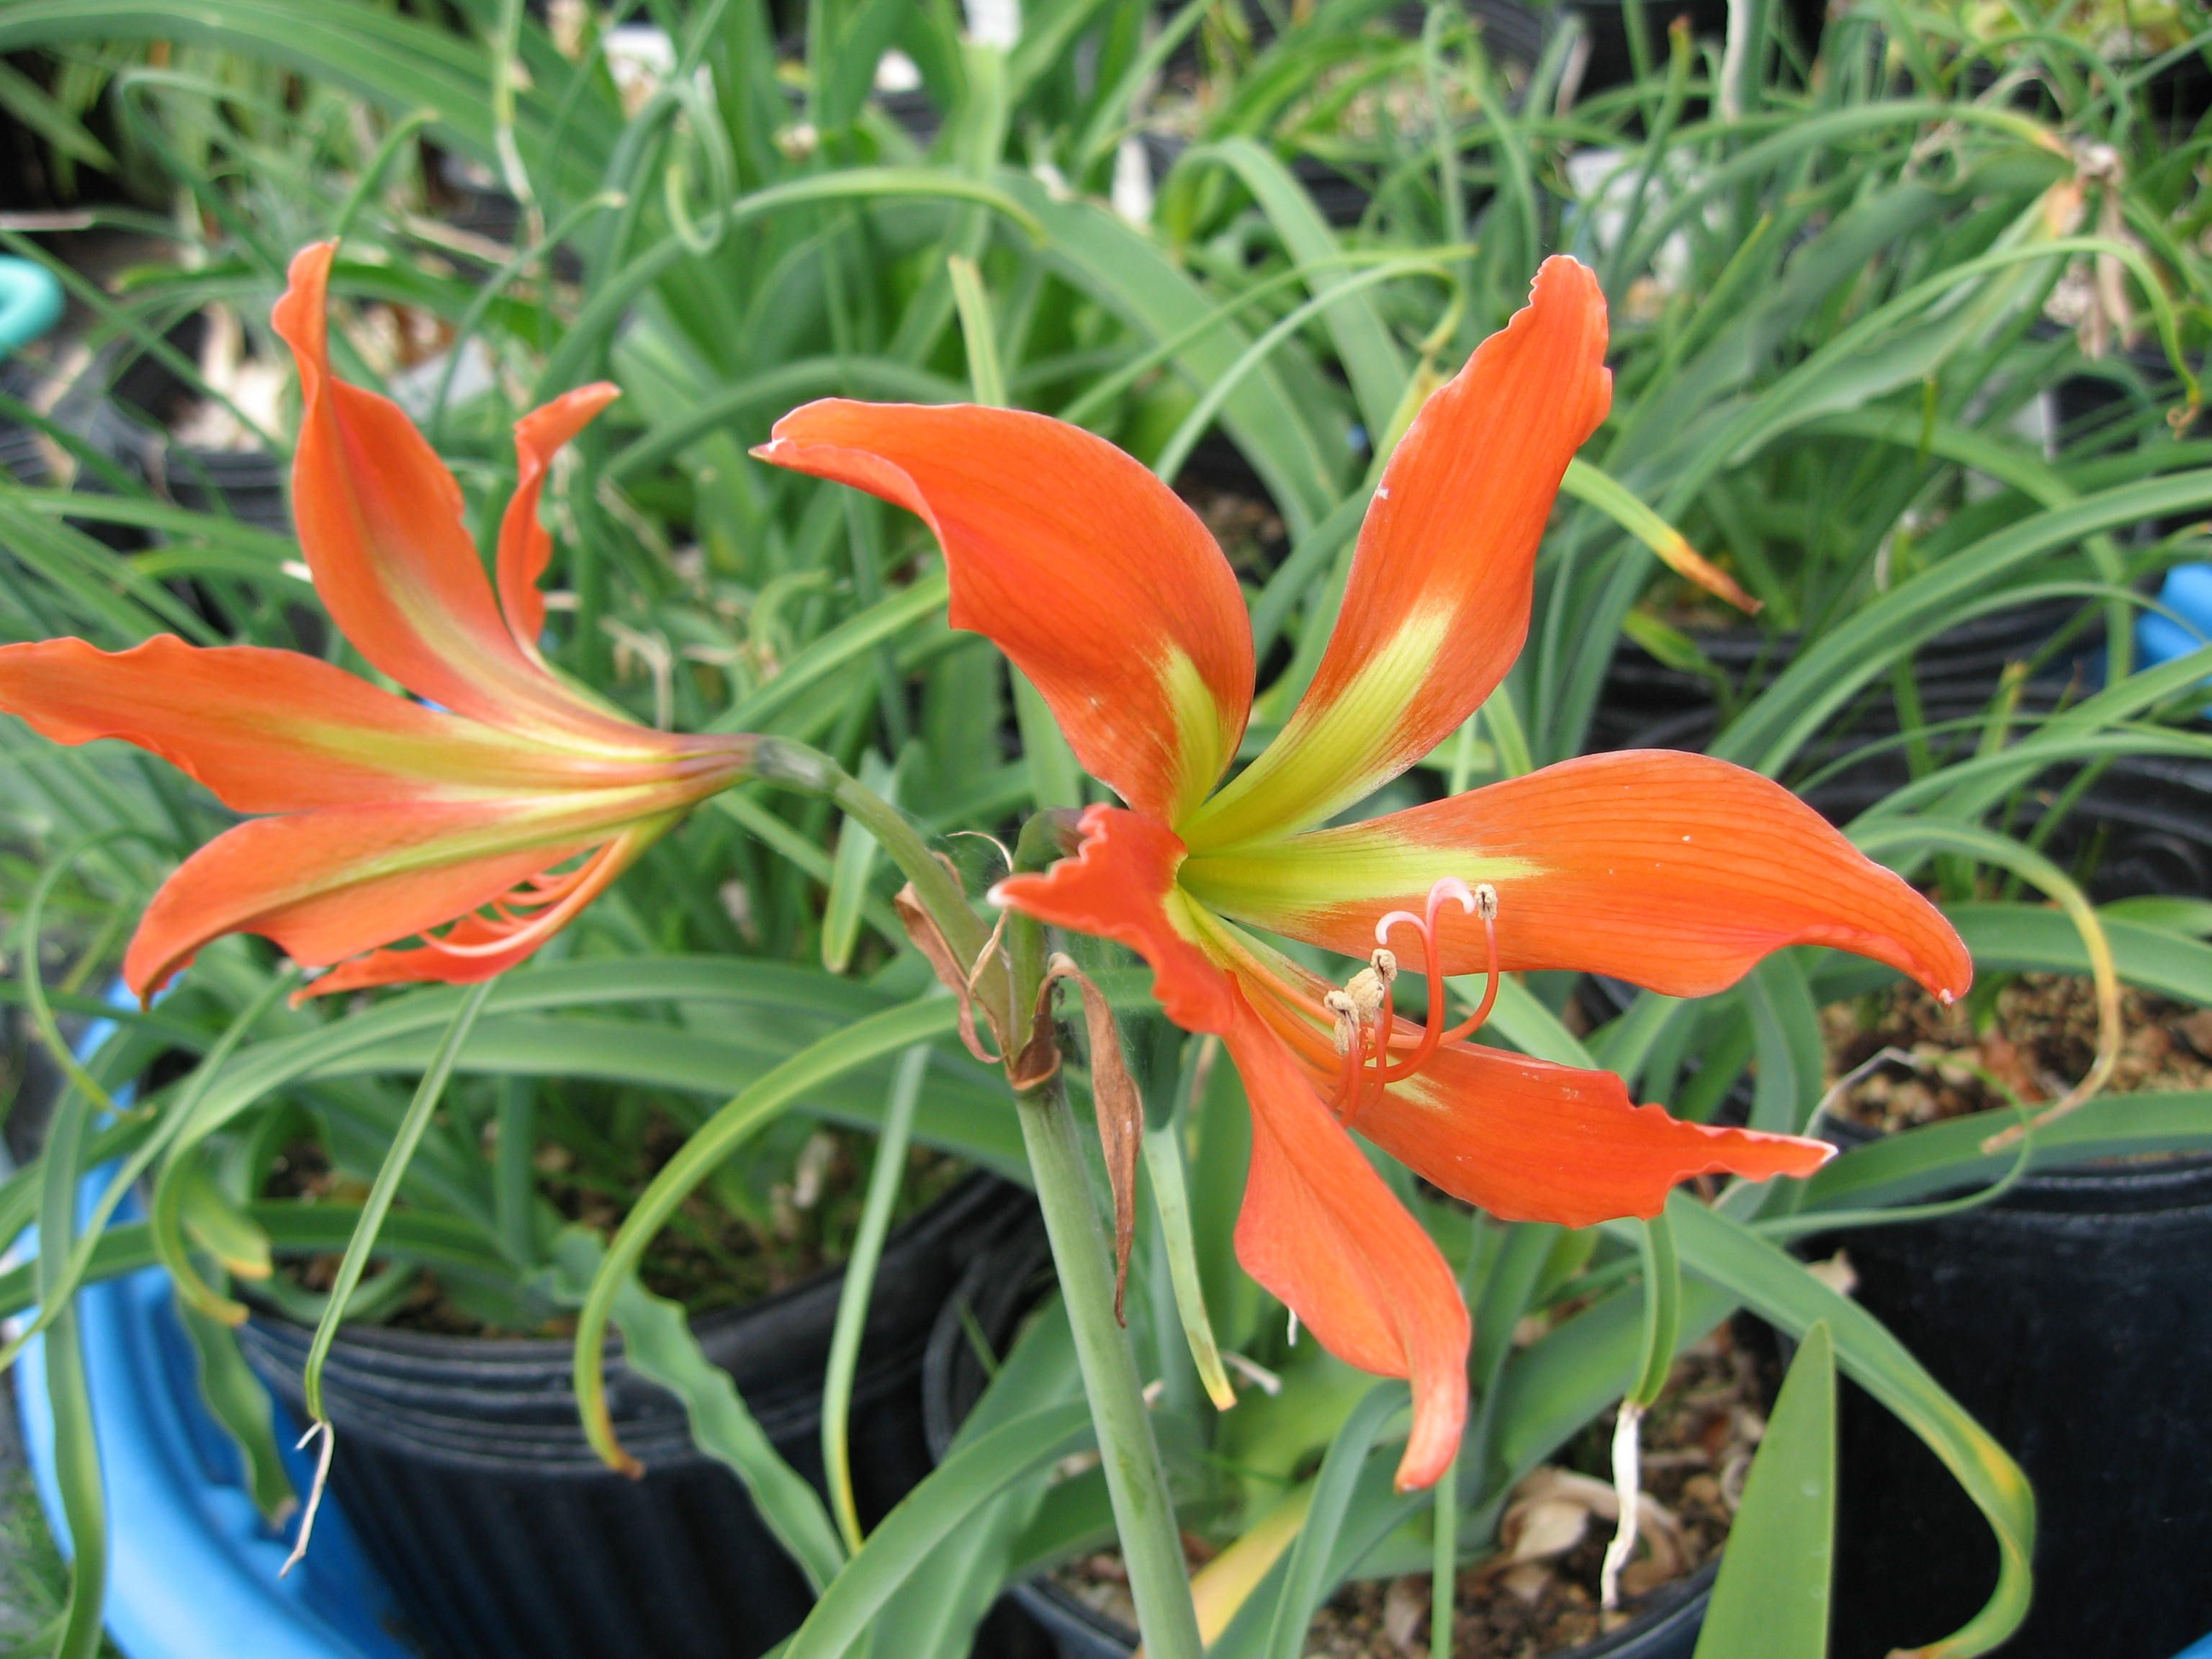 H 5705 Hippeastrum Blossfeldiae Each 2500 Beautiful Tangerine